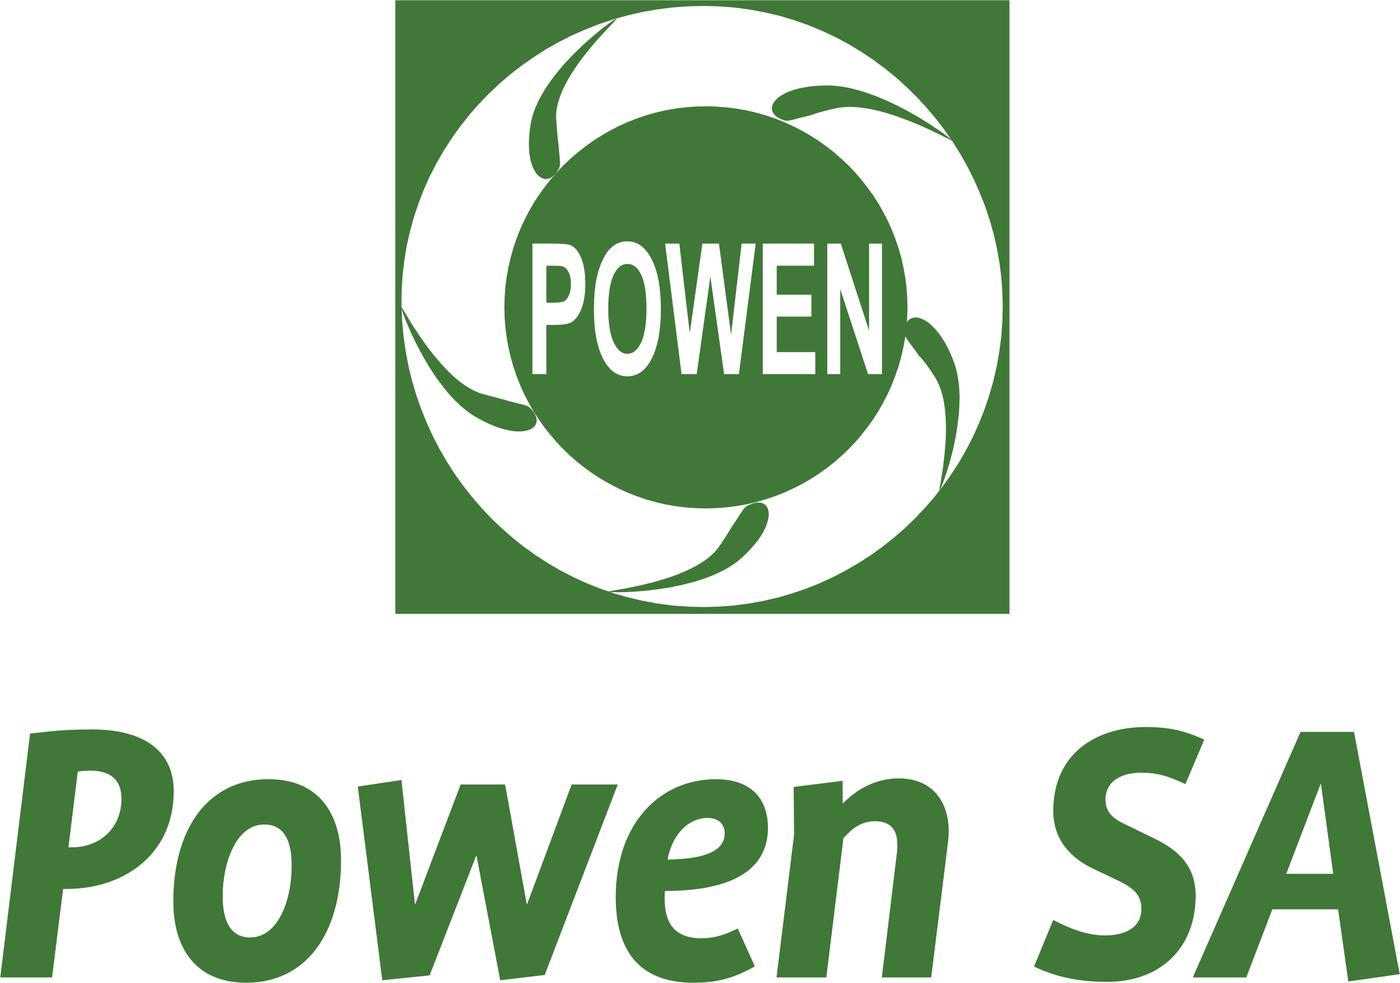 POWEN S.A.